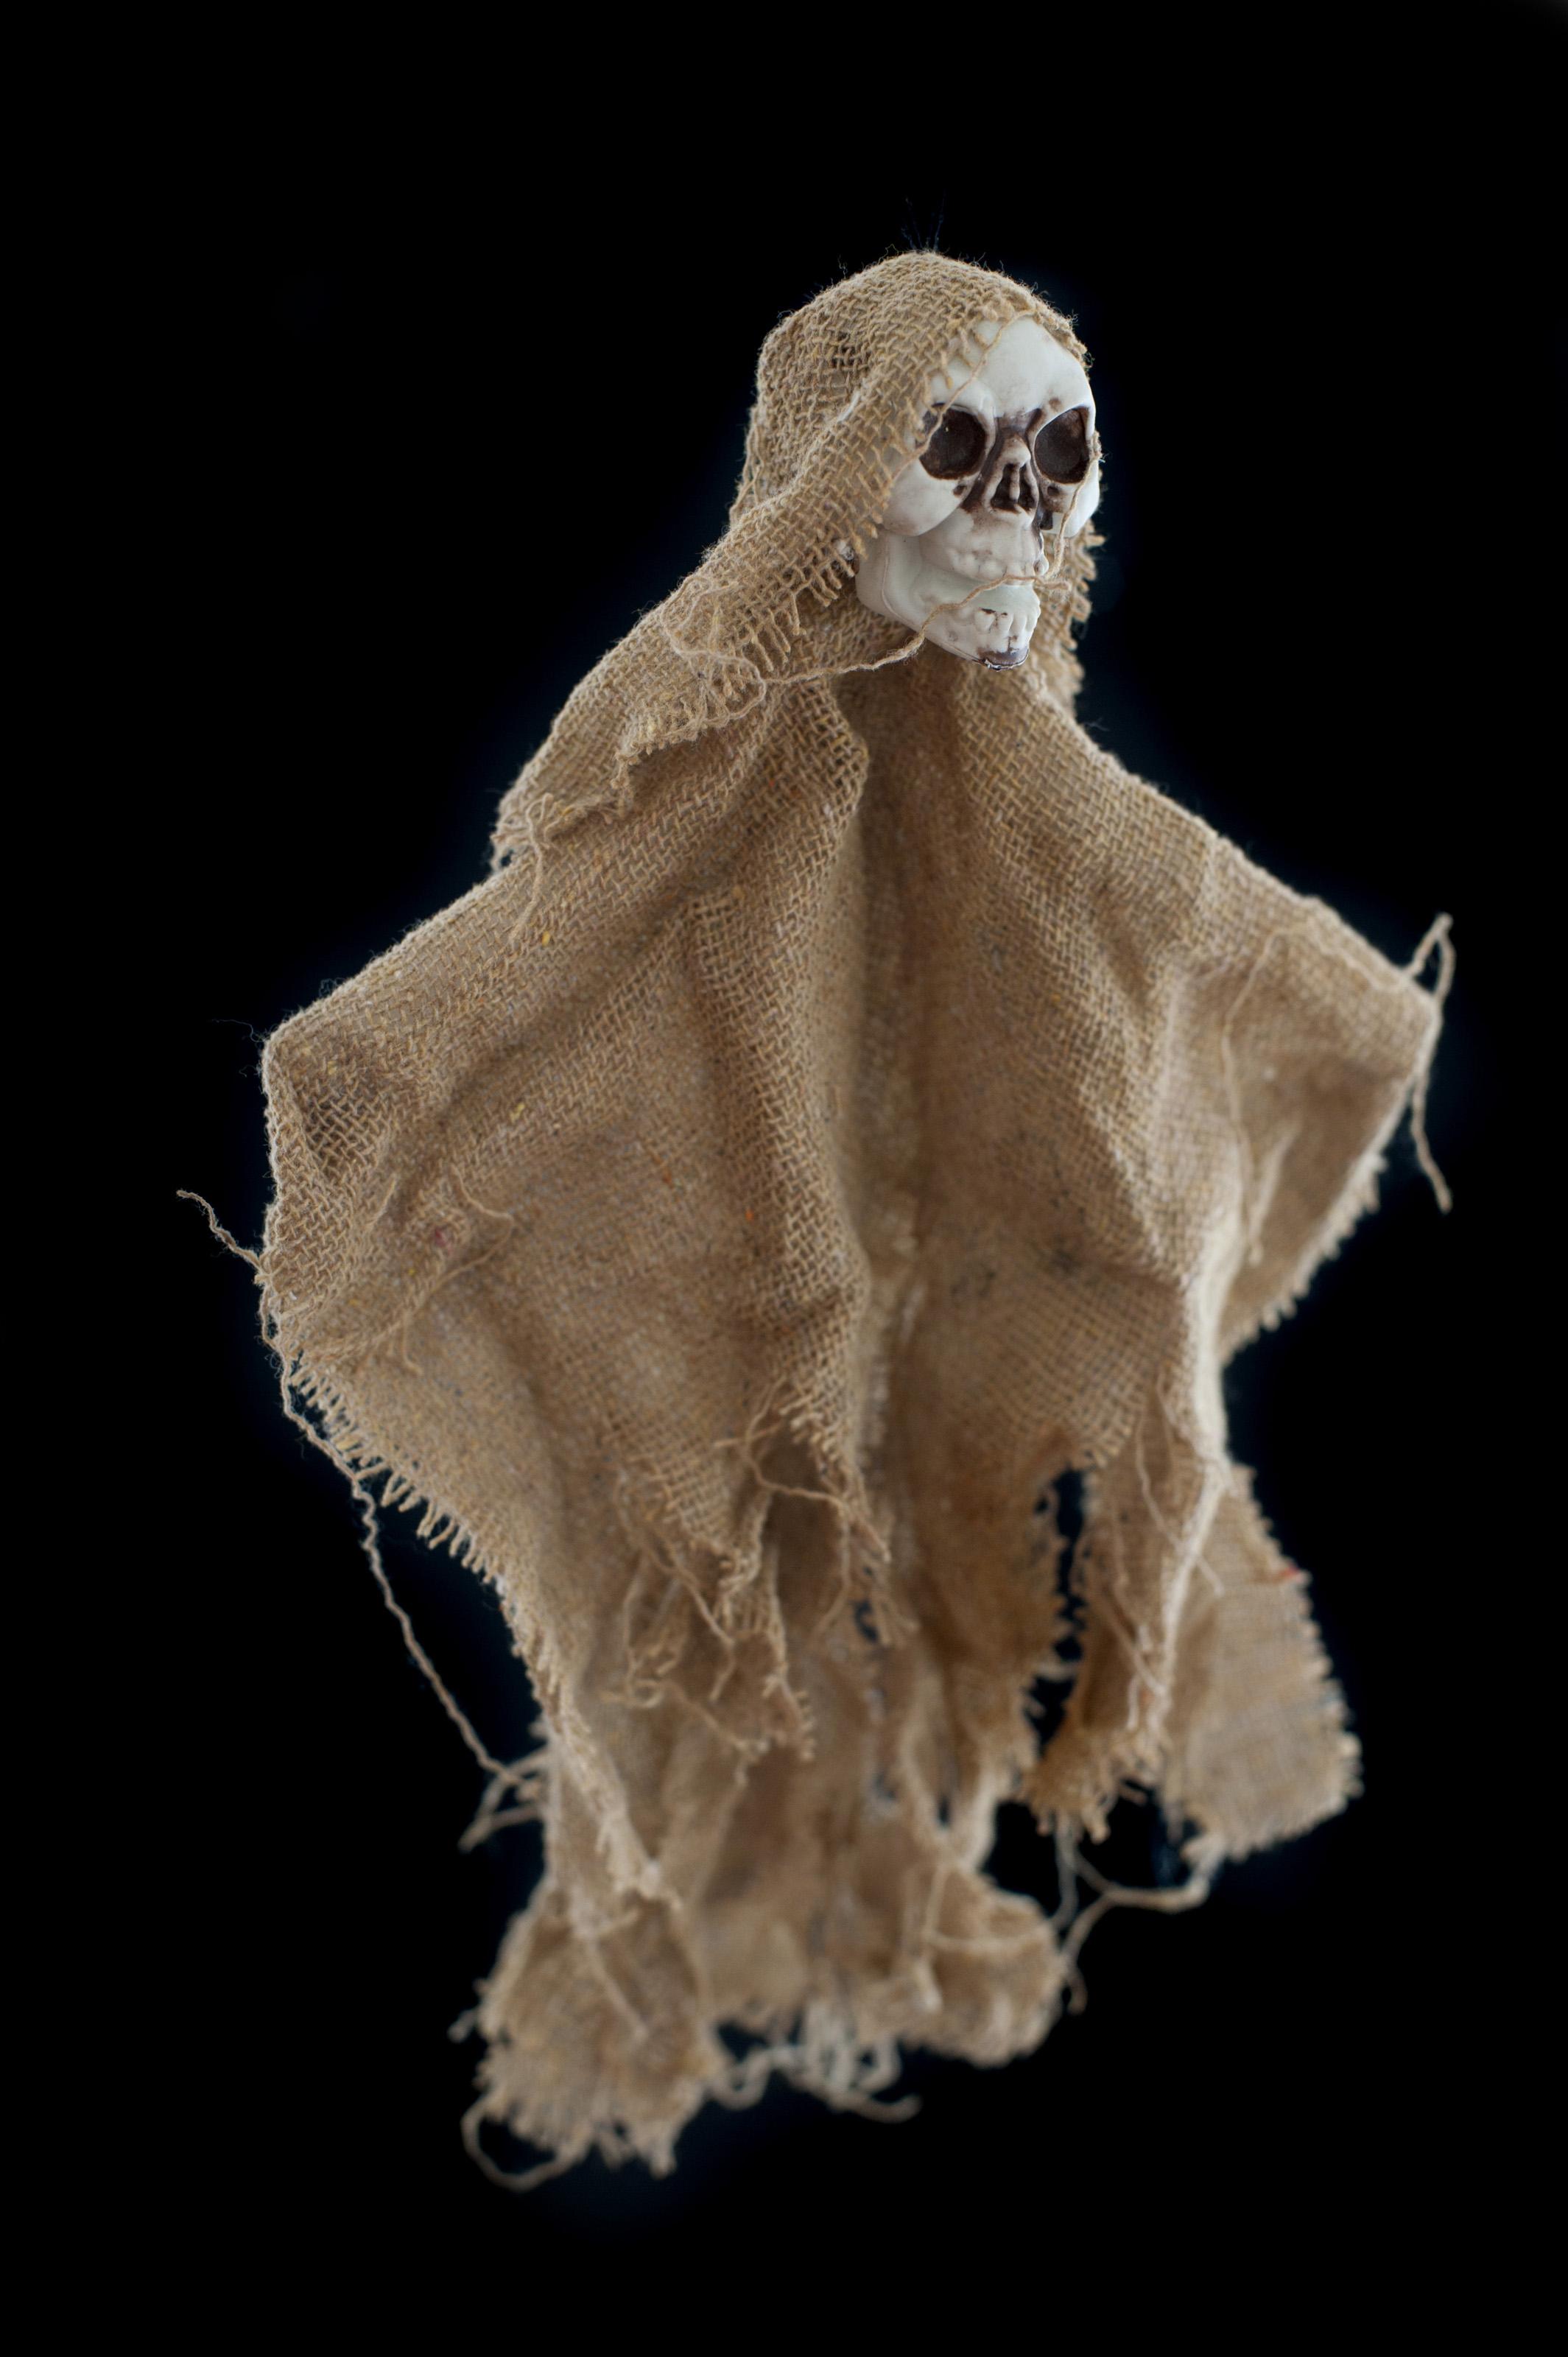 Free Image Of Rustic Halloween Skull Decoration